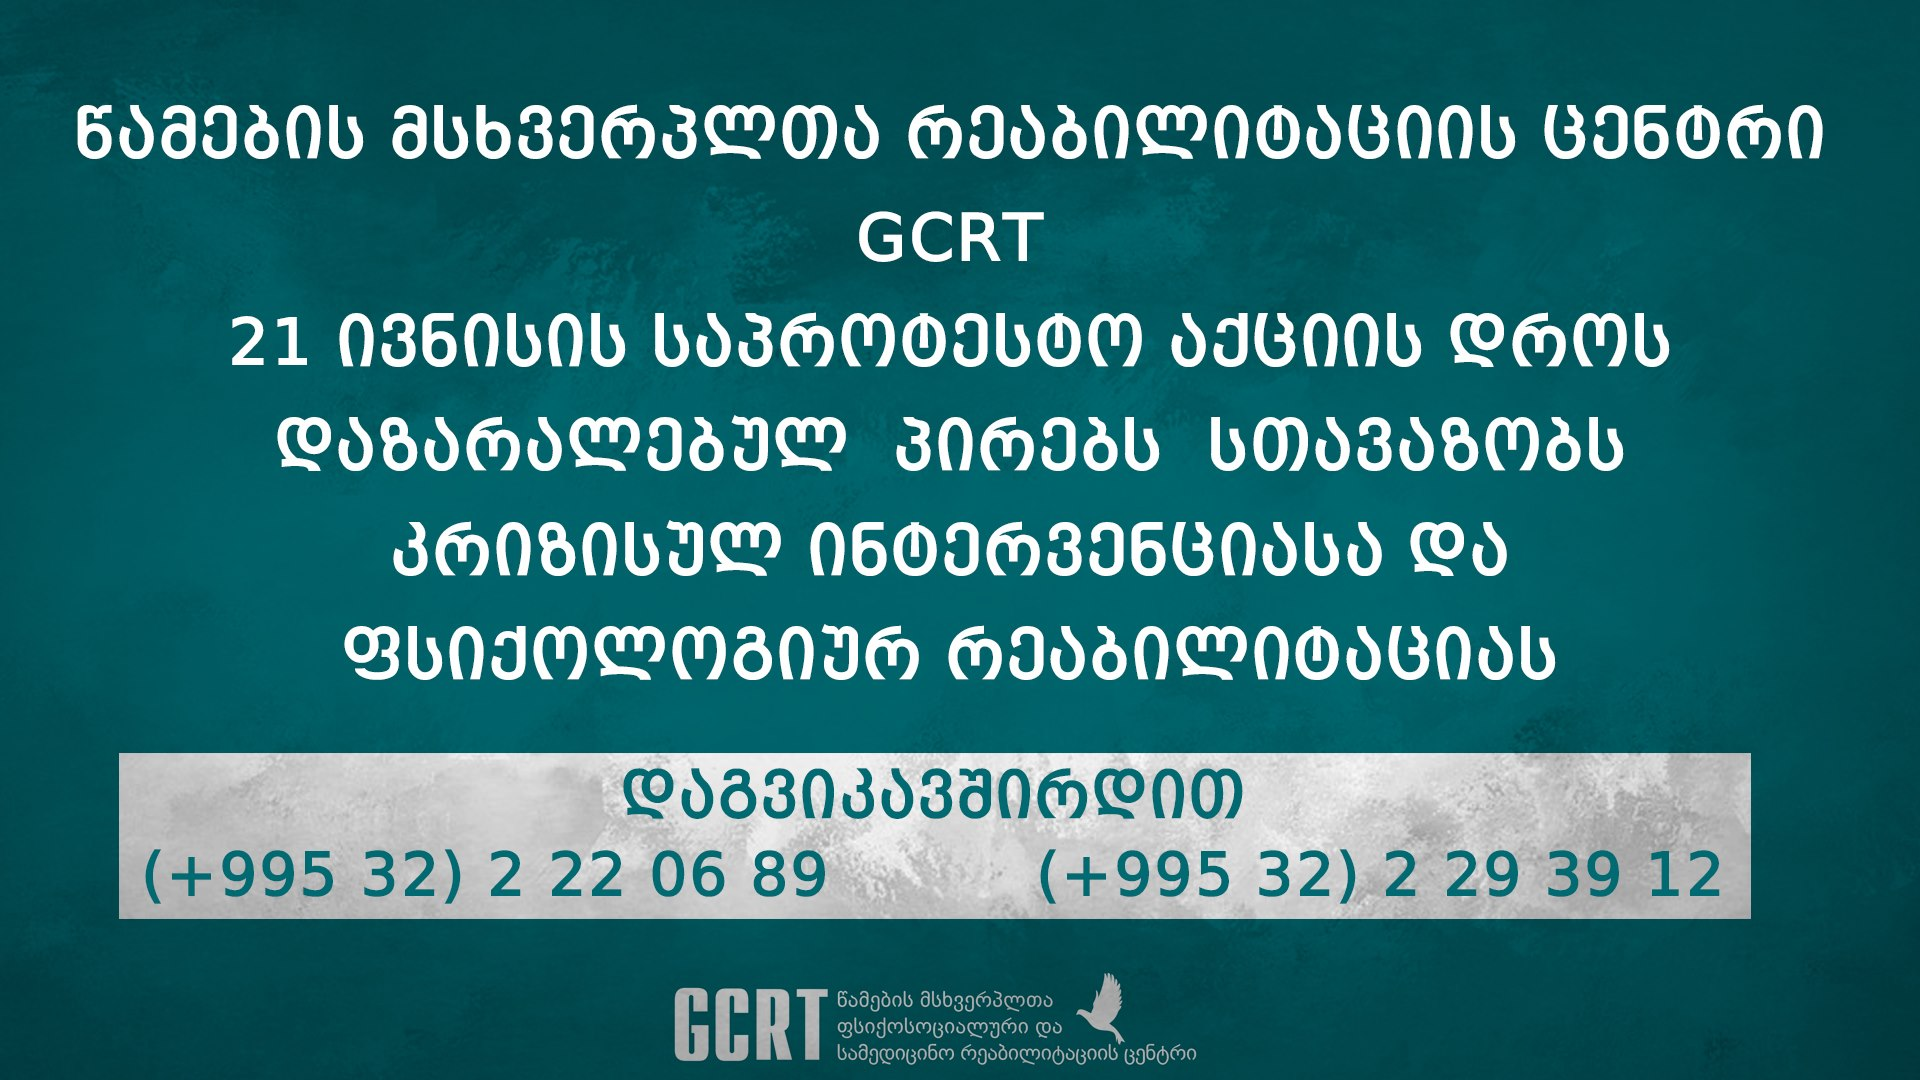 GCRT 21 ივნისს დაზარალებულებს დახმარებას სთავაზობს